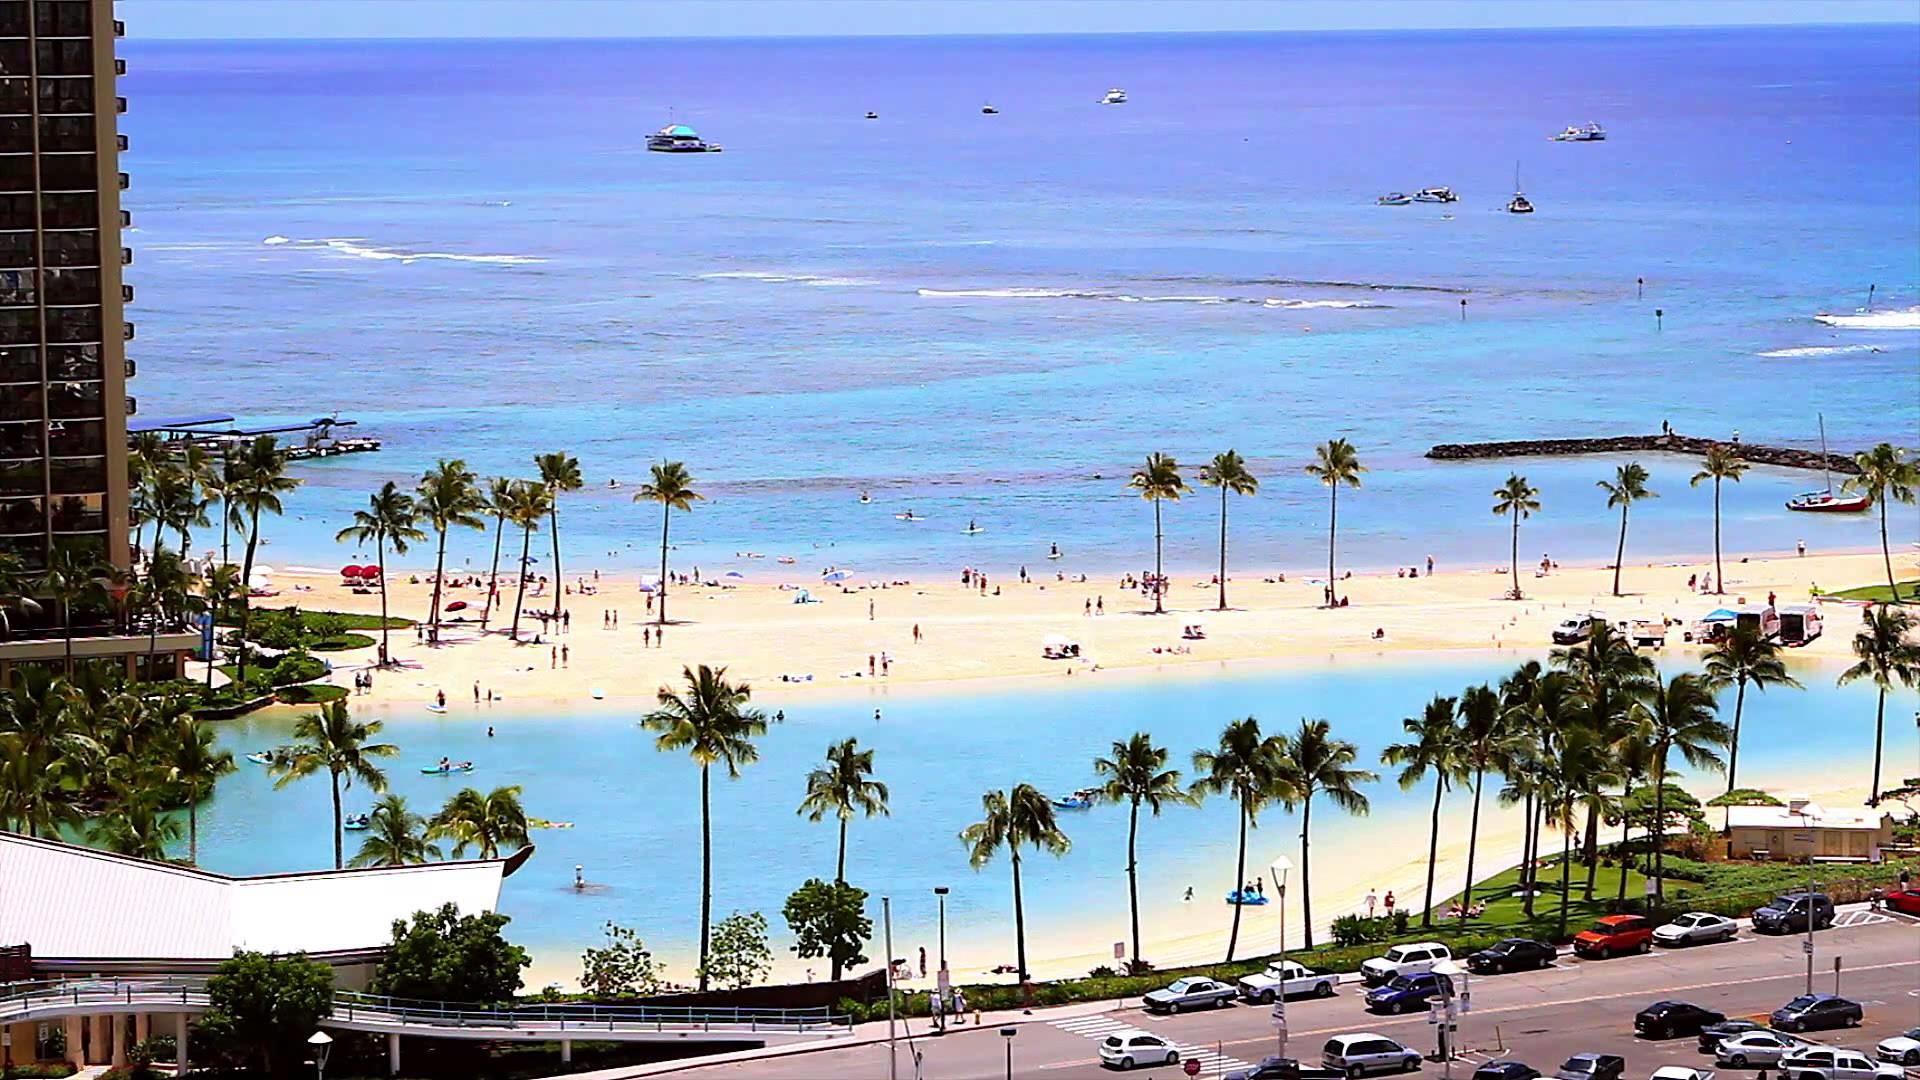 Res: 1920x1080, Waikiki Beach Hd Wallpaper